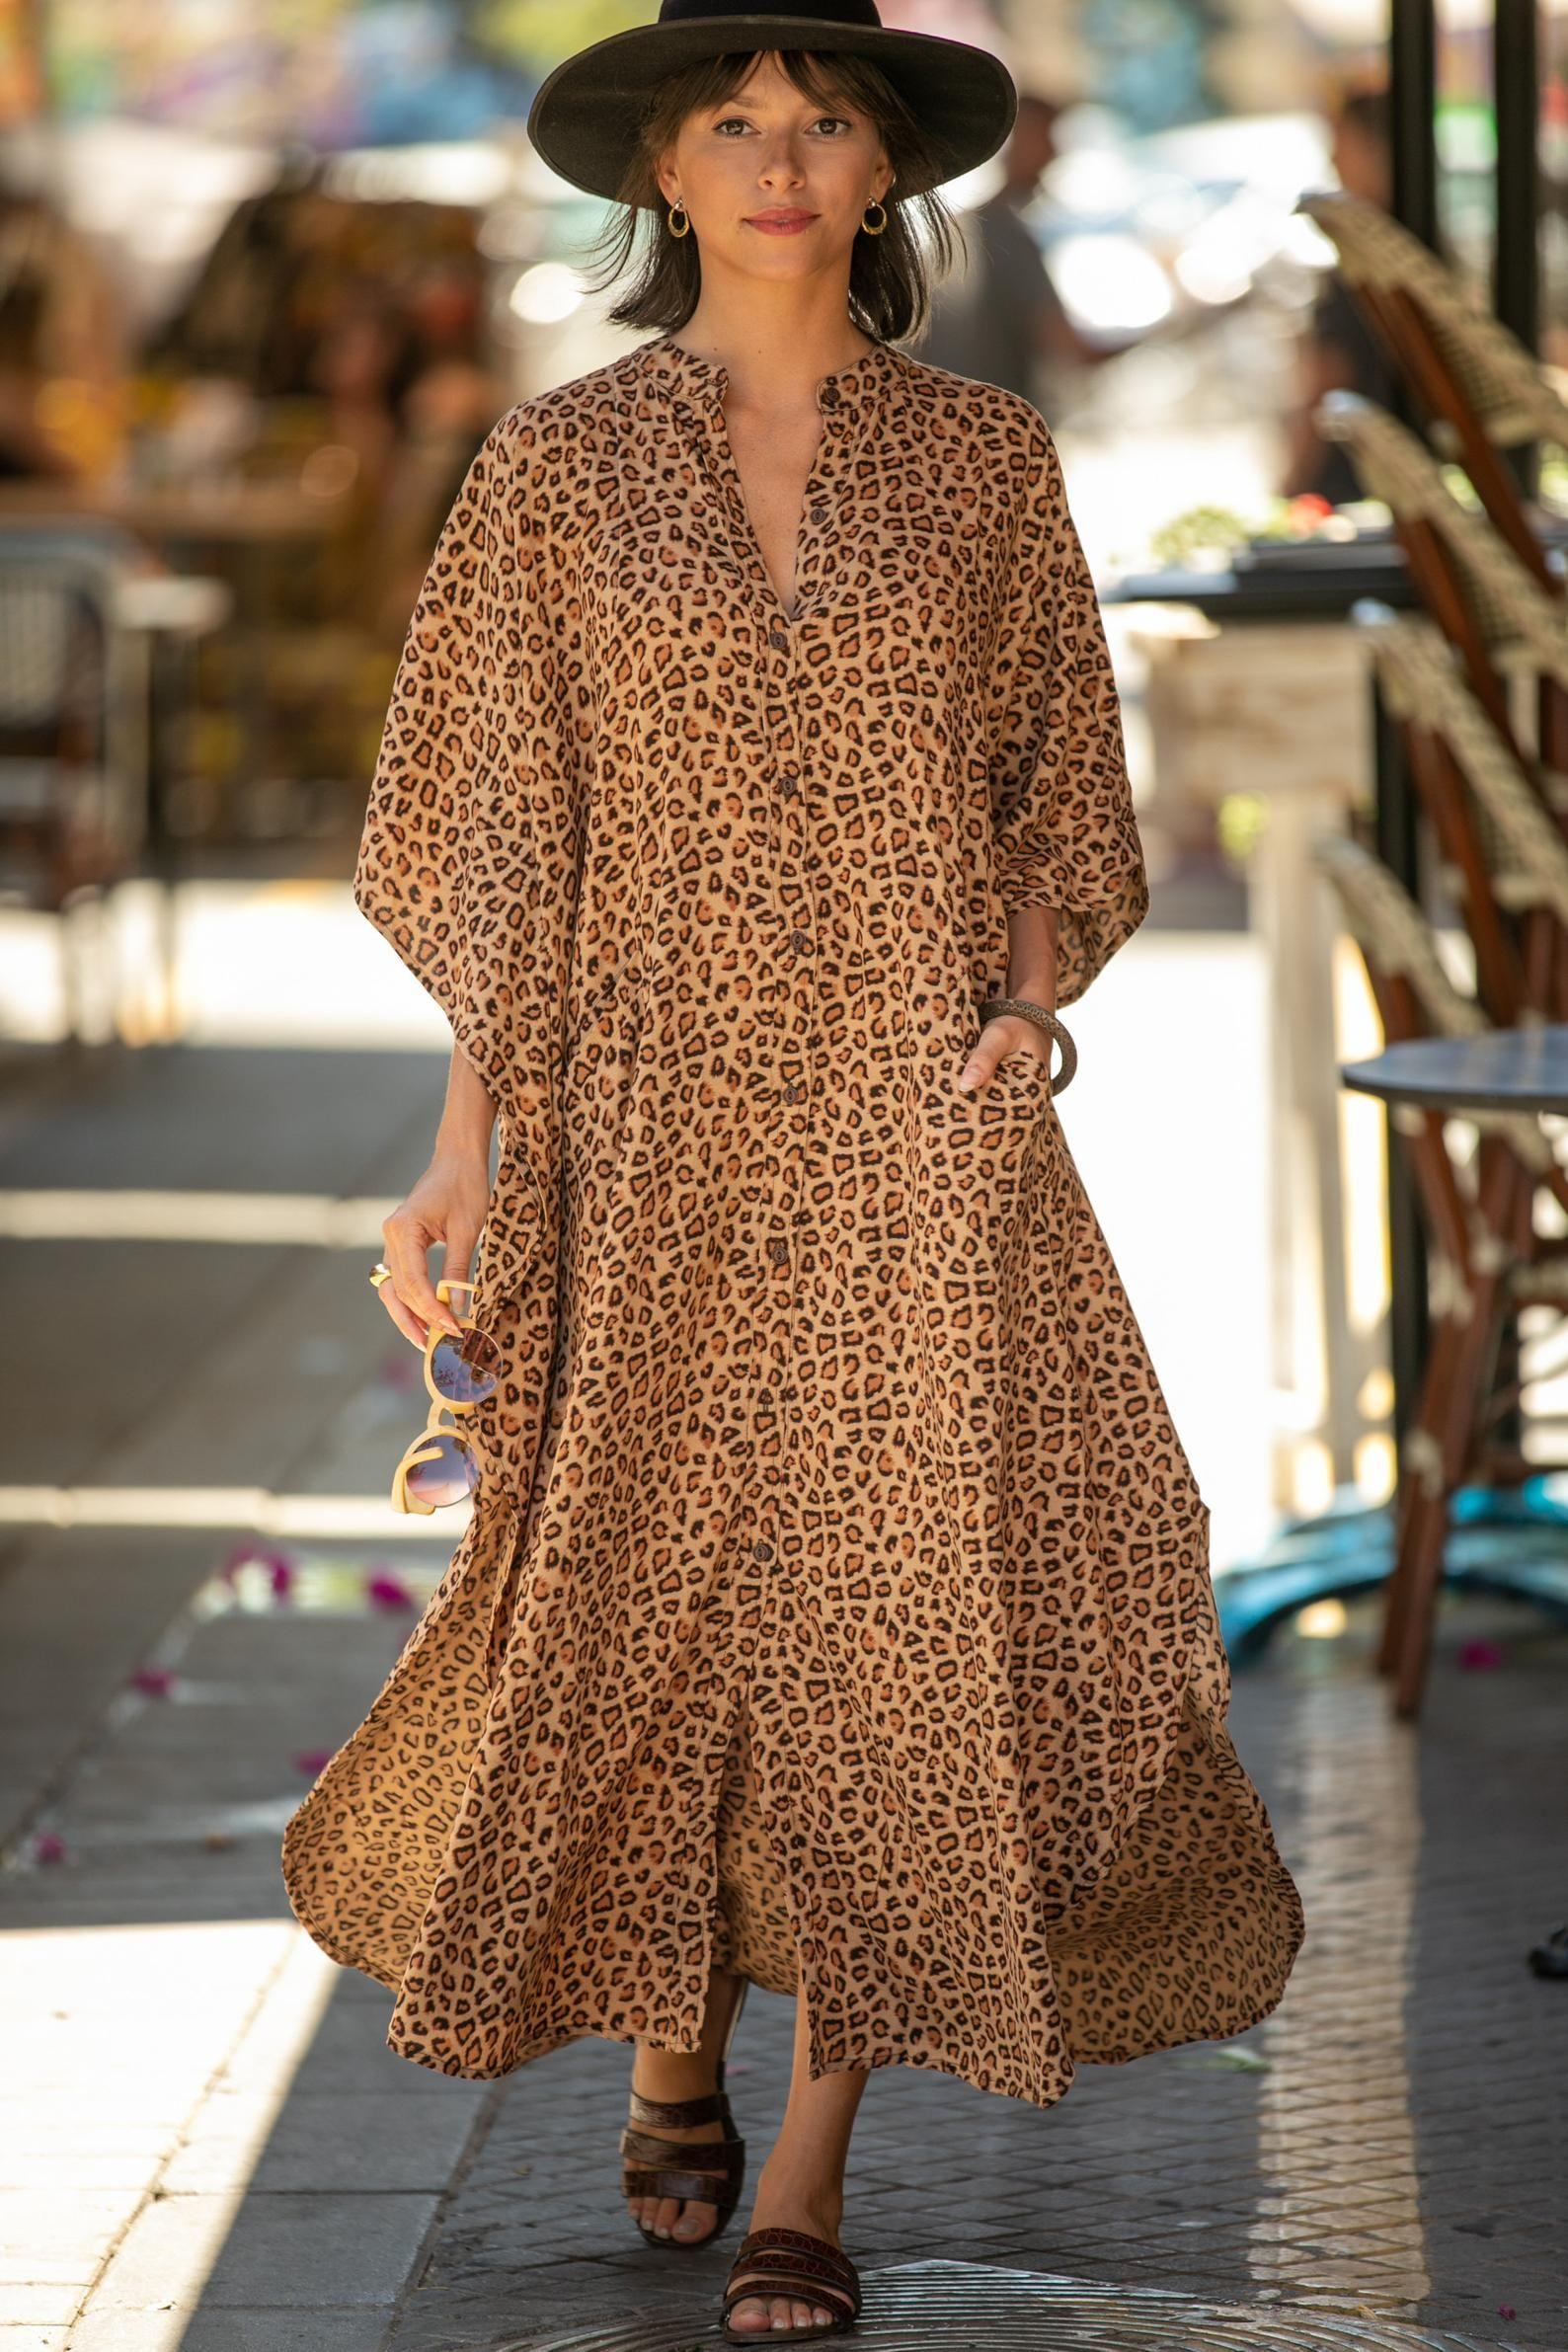 Leopard Print Oversize Kaftan Maxi Dress Boho Hipster Caftan Summer Urban Vacation Dress Hipster Abaya Women S Dress Plus Size Dress Printed Beach Dresses Boho Shift Dress Kaftan Maxi Dress [ 2382 x 1588 Pixel ]